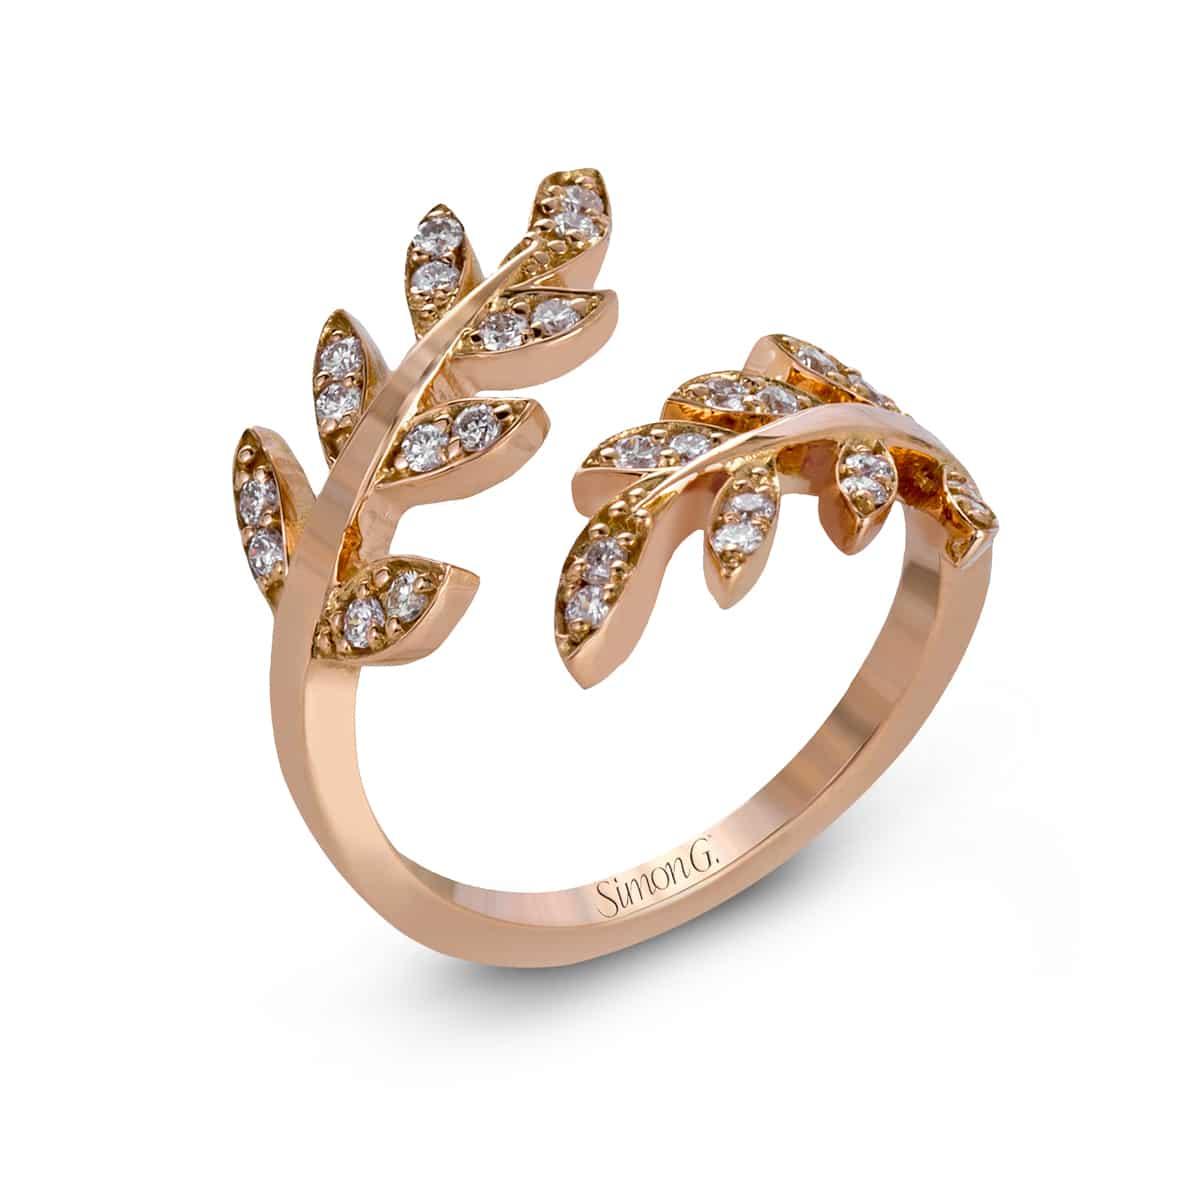 Simon G leaf ring